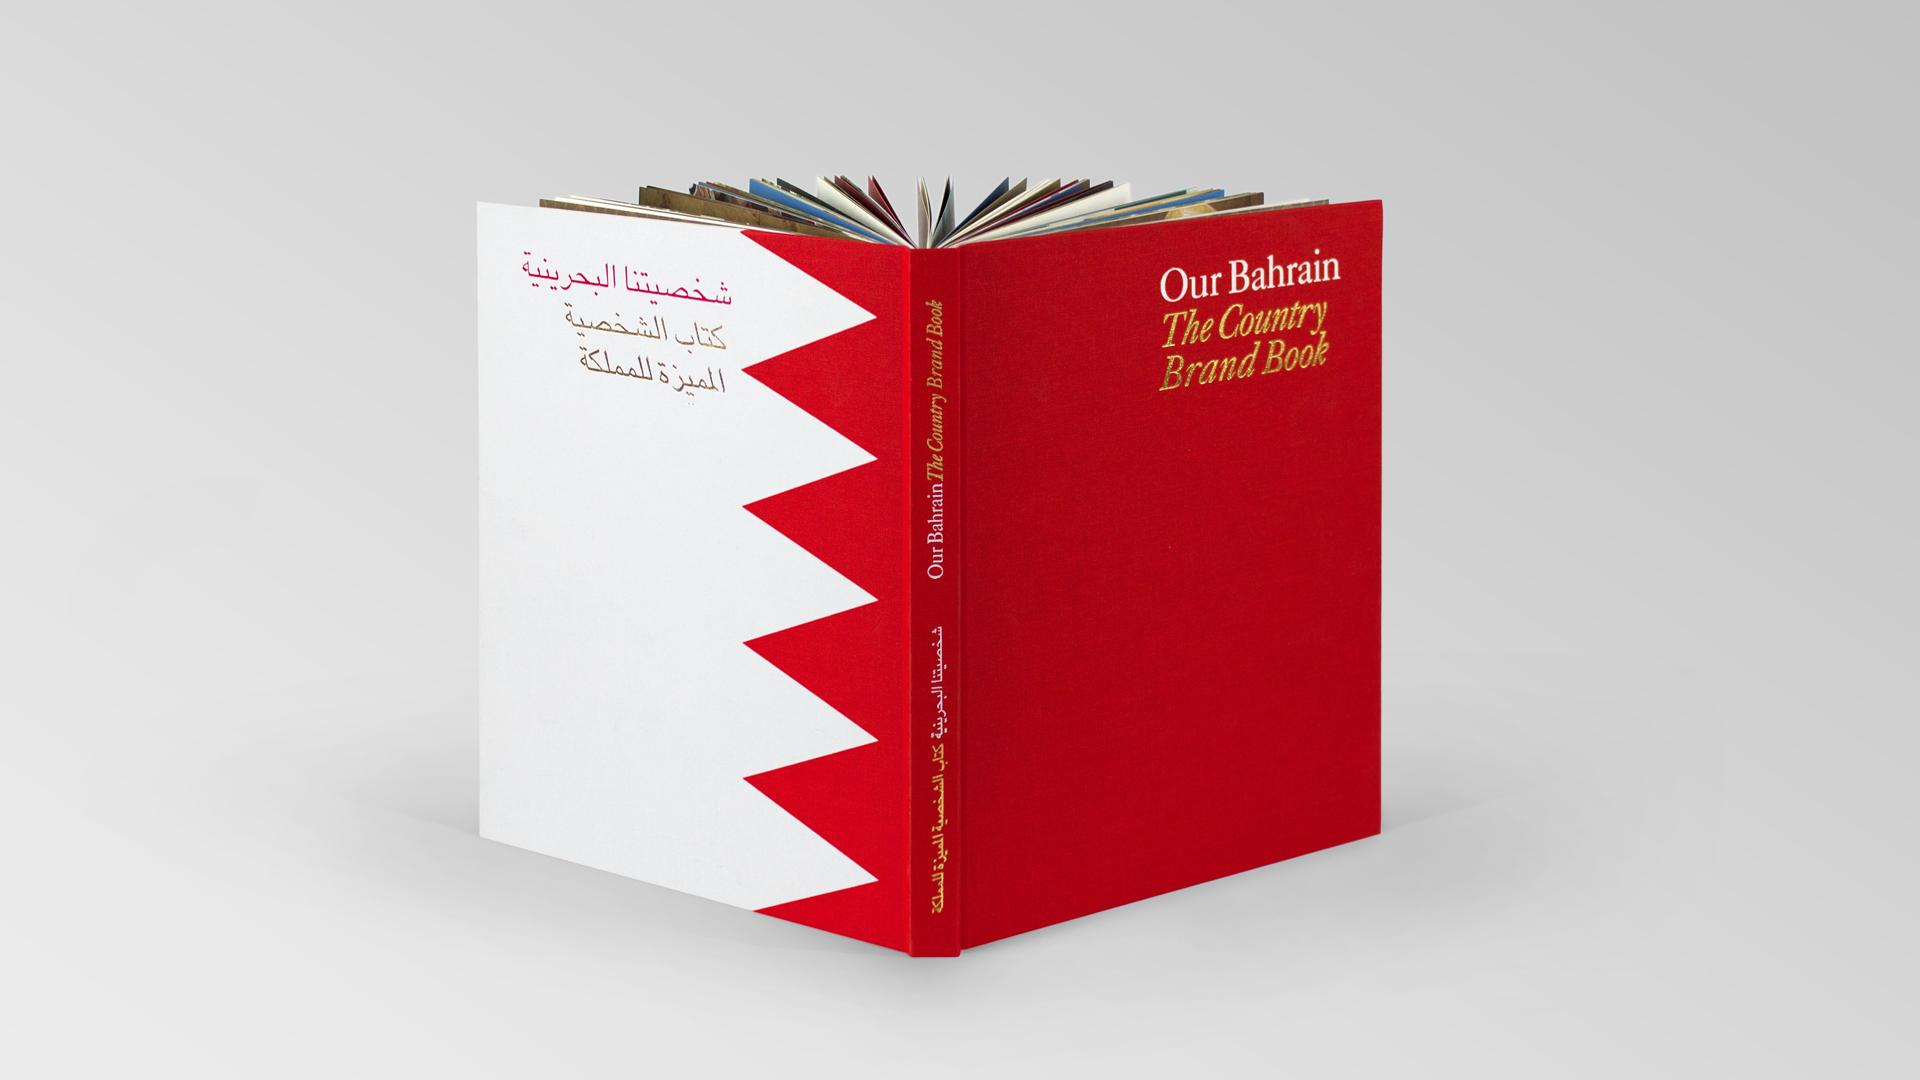 Bahrain EDB: brand book